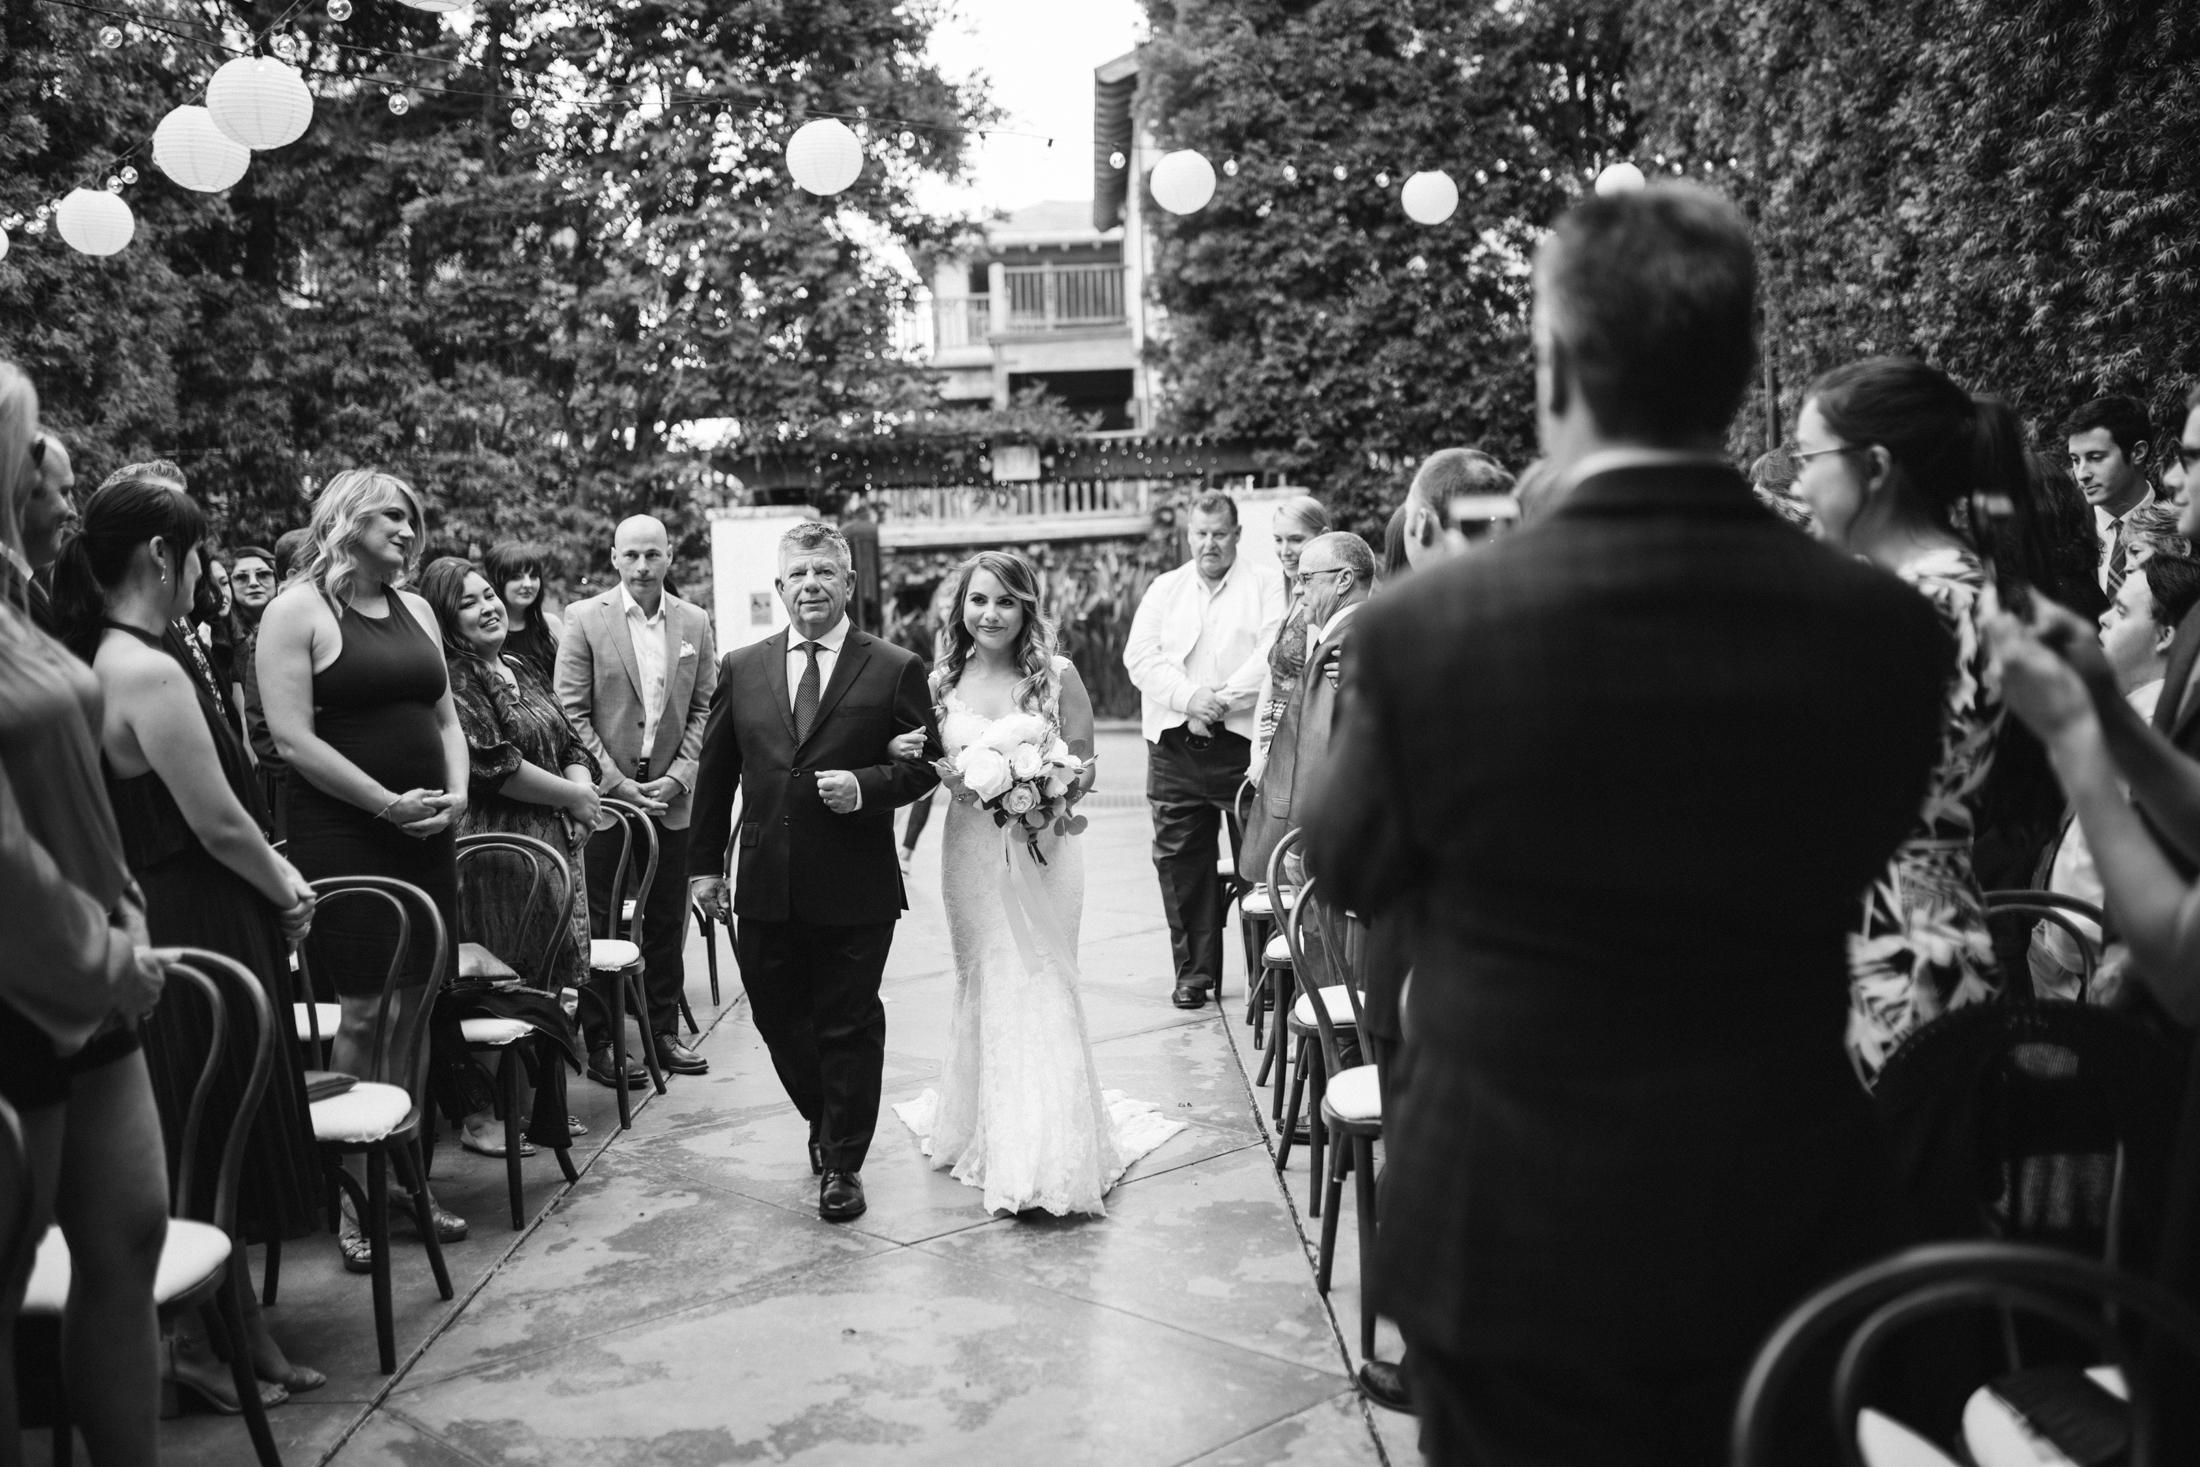 franciscan_garden_wedding-38.jpg